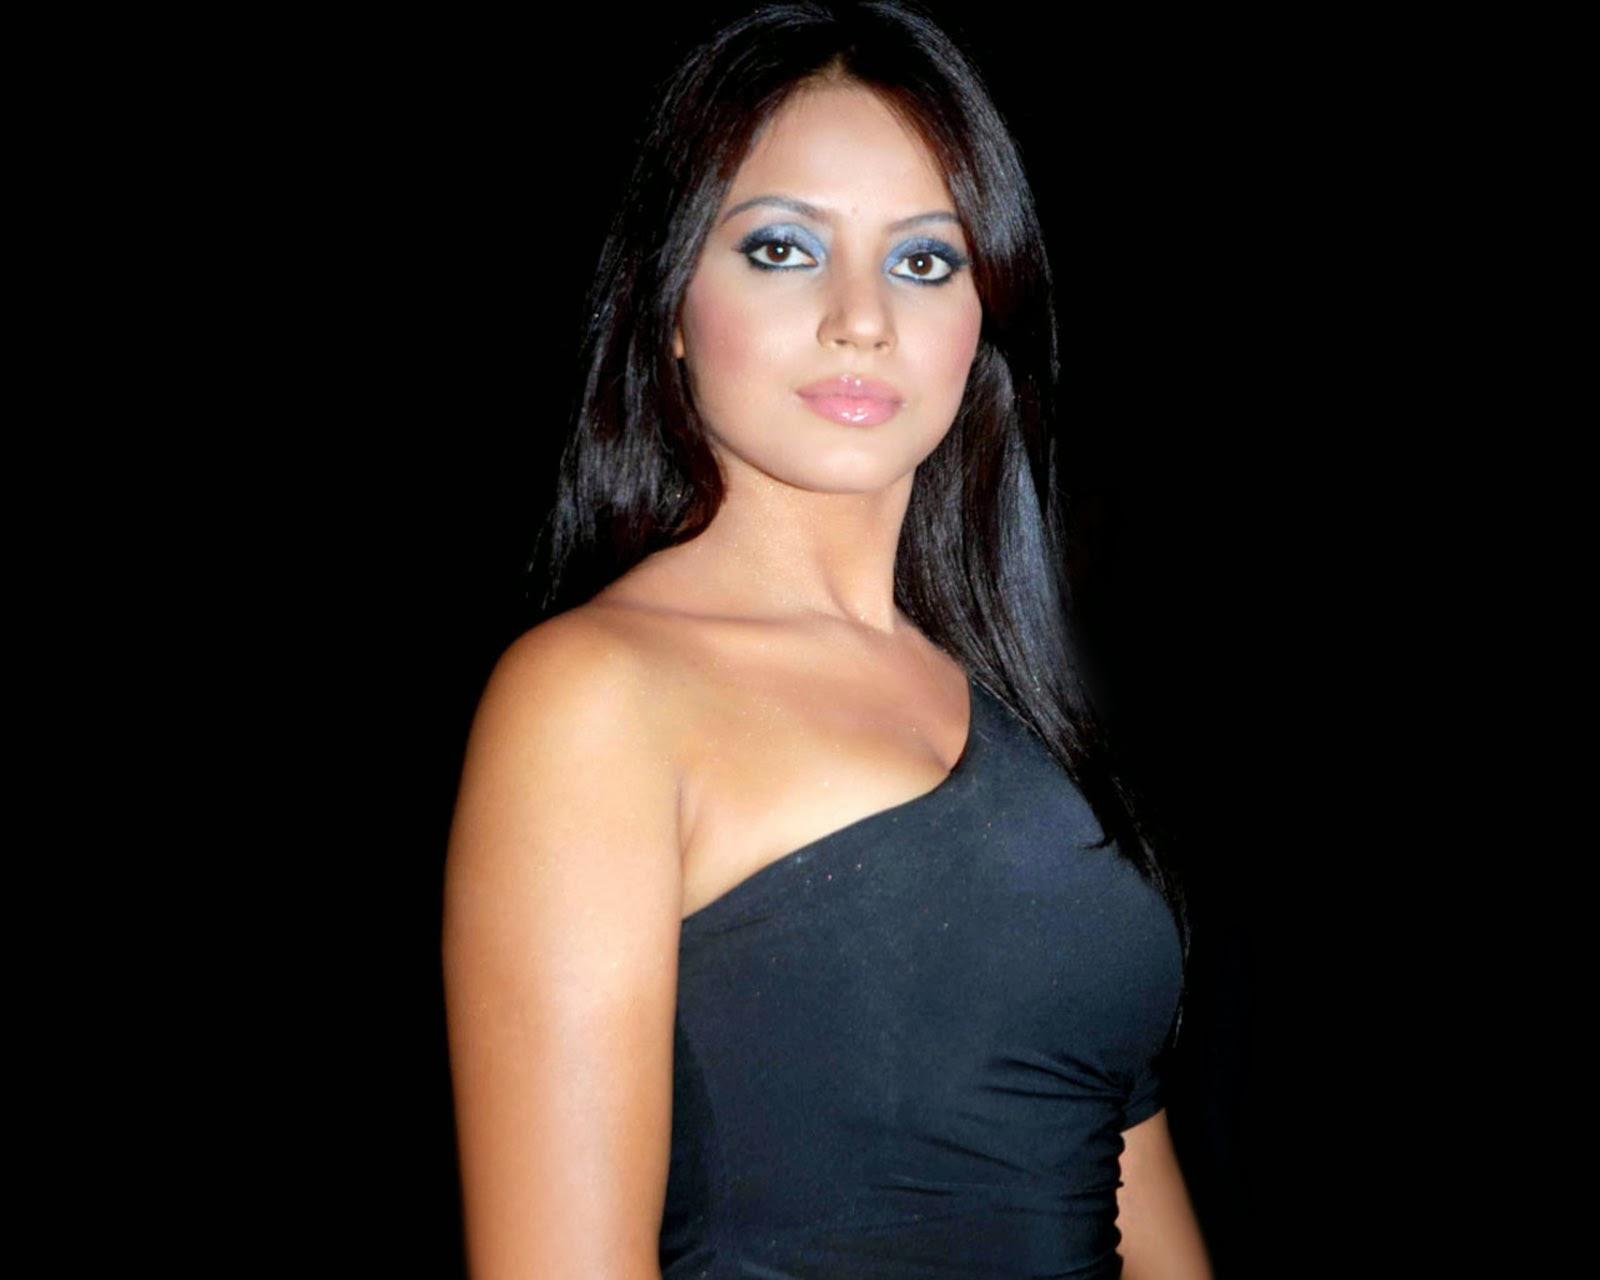 Sonarika Bhadoria Hd Wallpapers Neetu Chandra Hd Photos Free Download Tv Biography